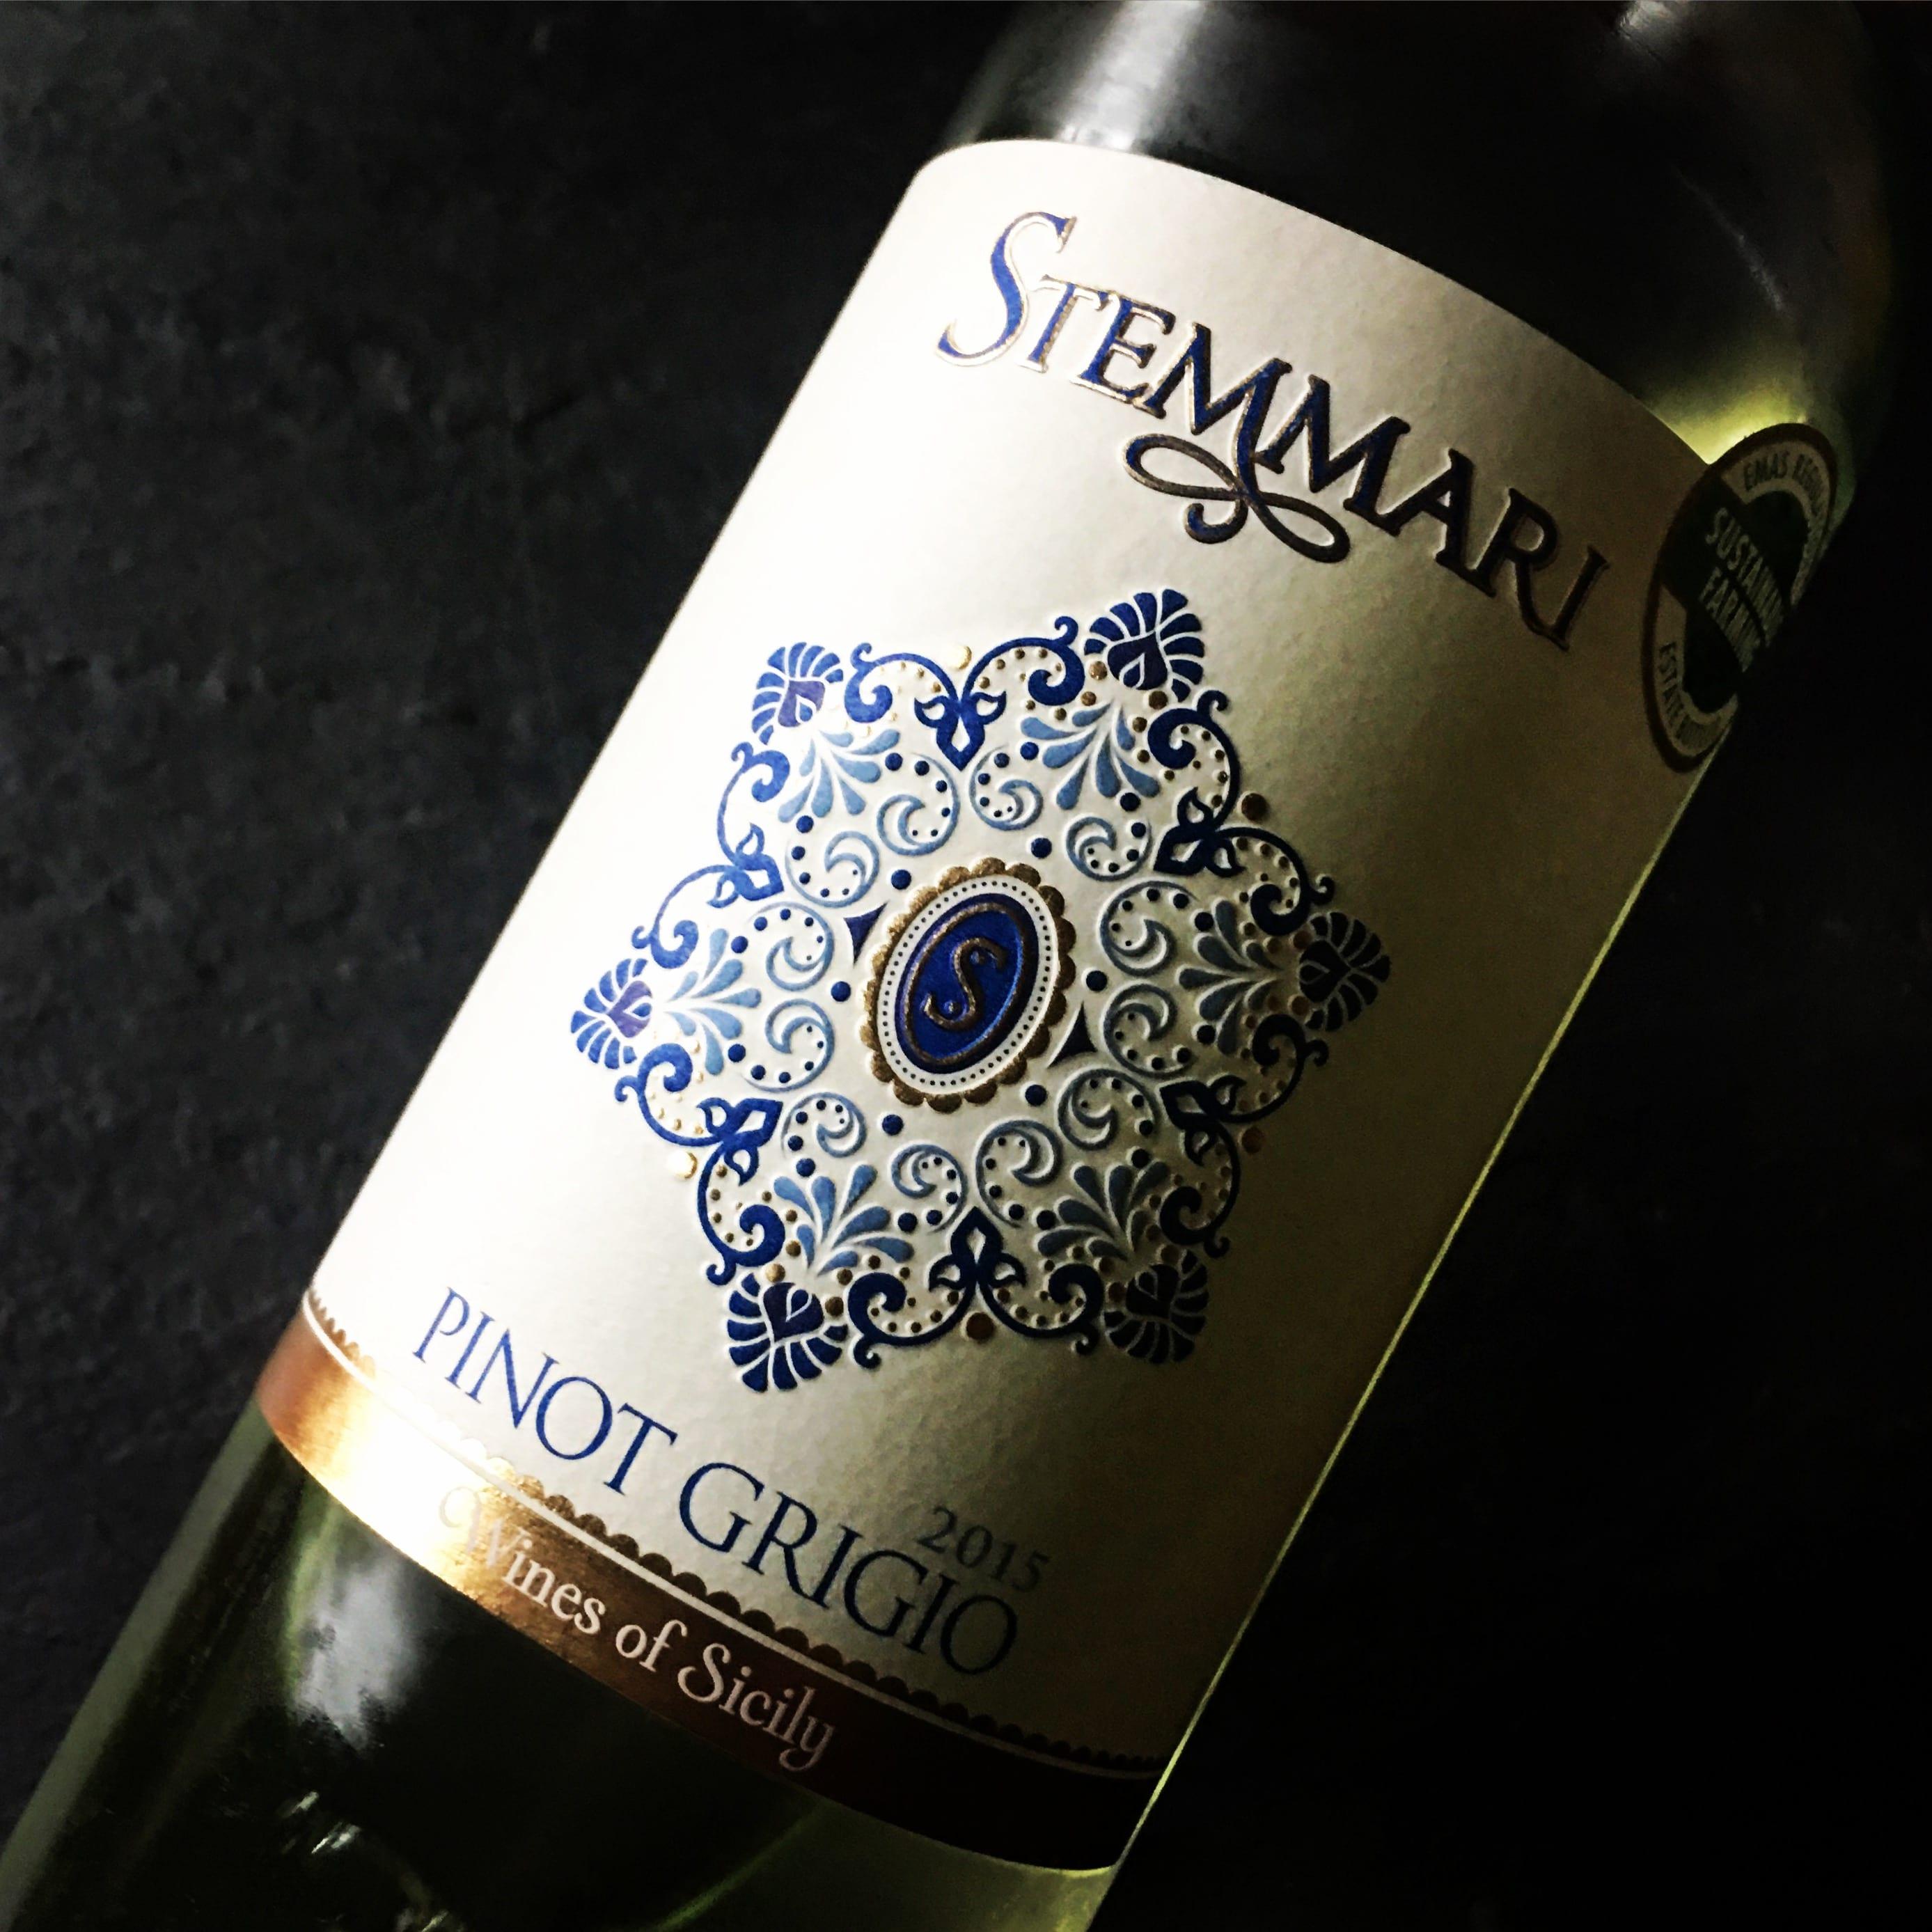 Feudo Arancio Pinot Grigio Sicilia Stemmari 2014